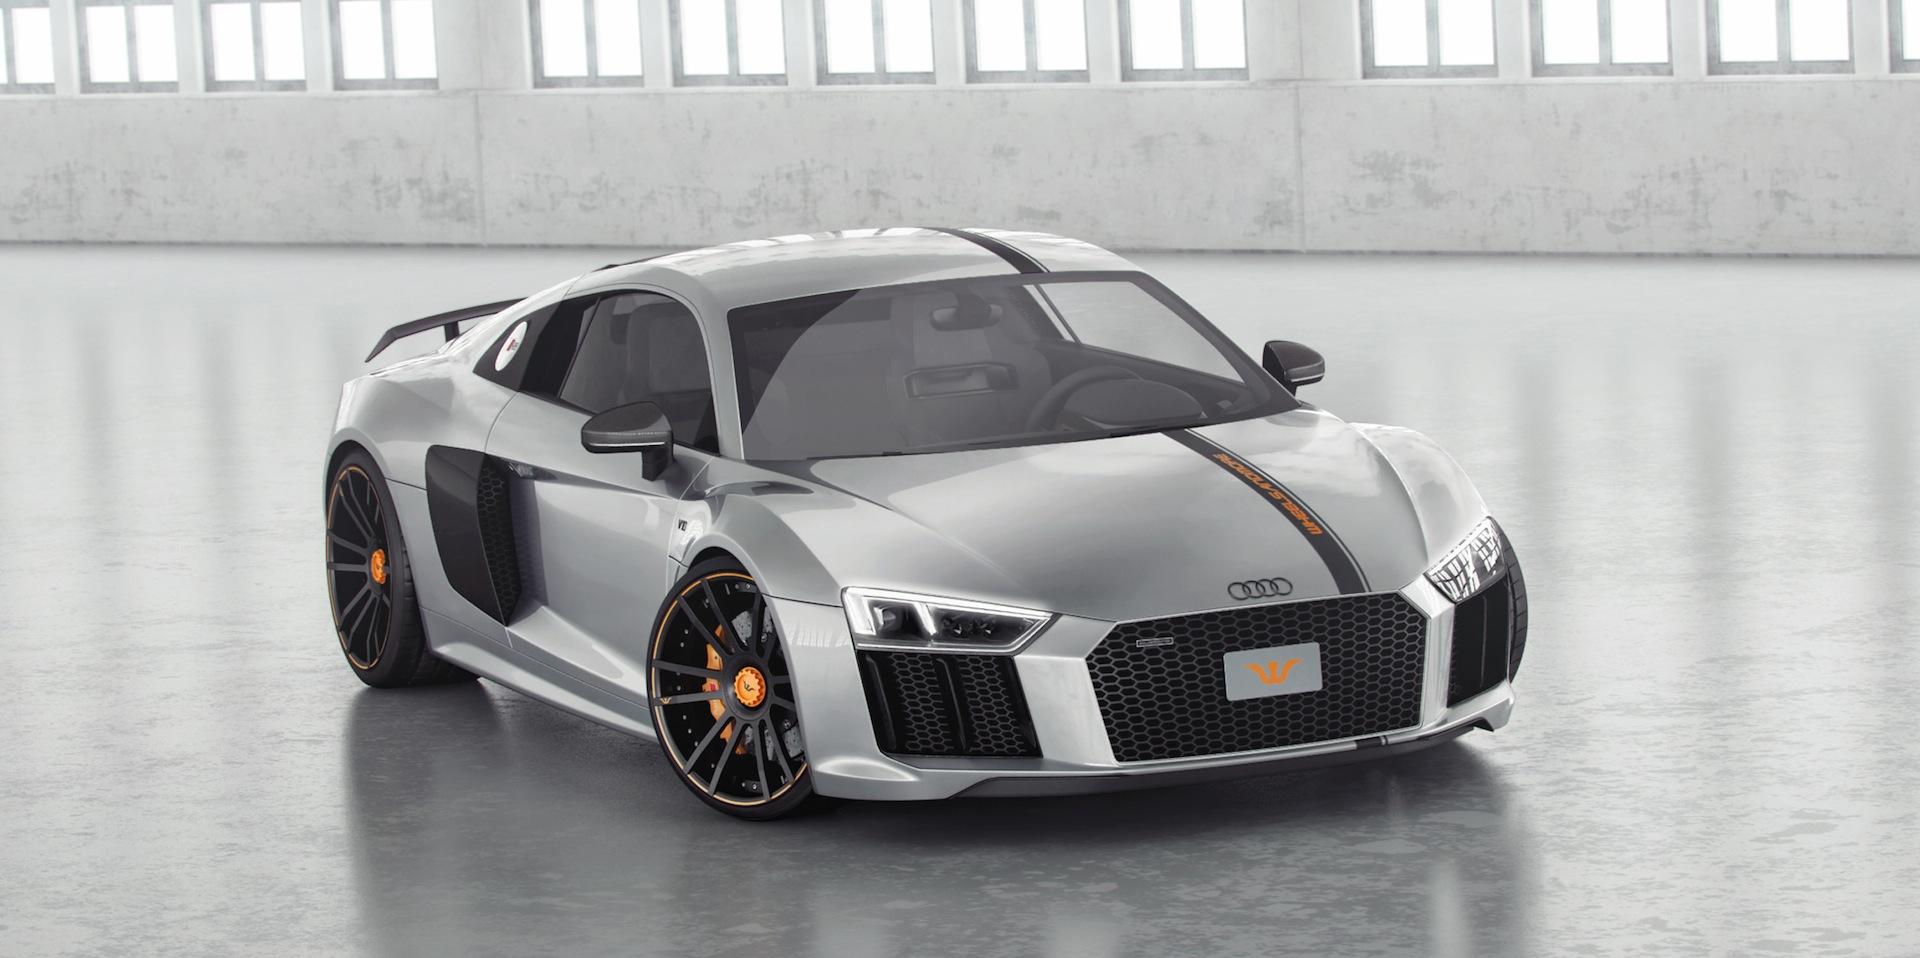 Official 850hp Audi R8 V10 Plus By Wheelsandmore Gtspirit